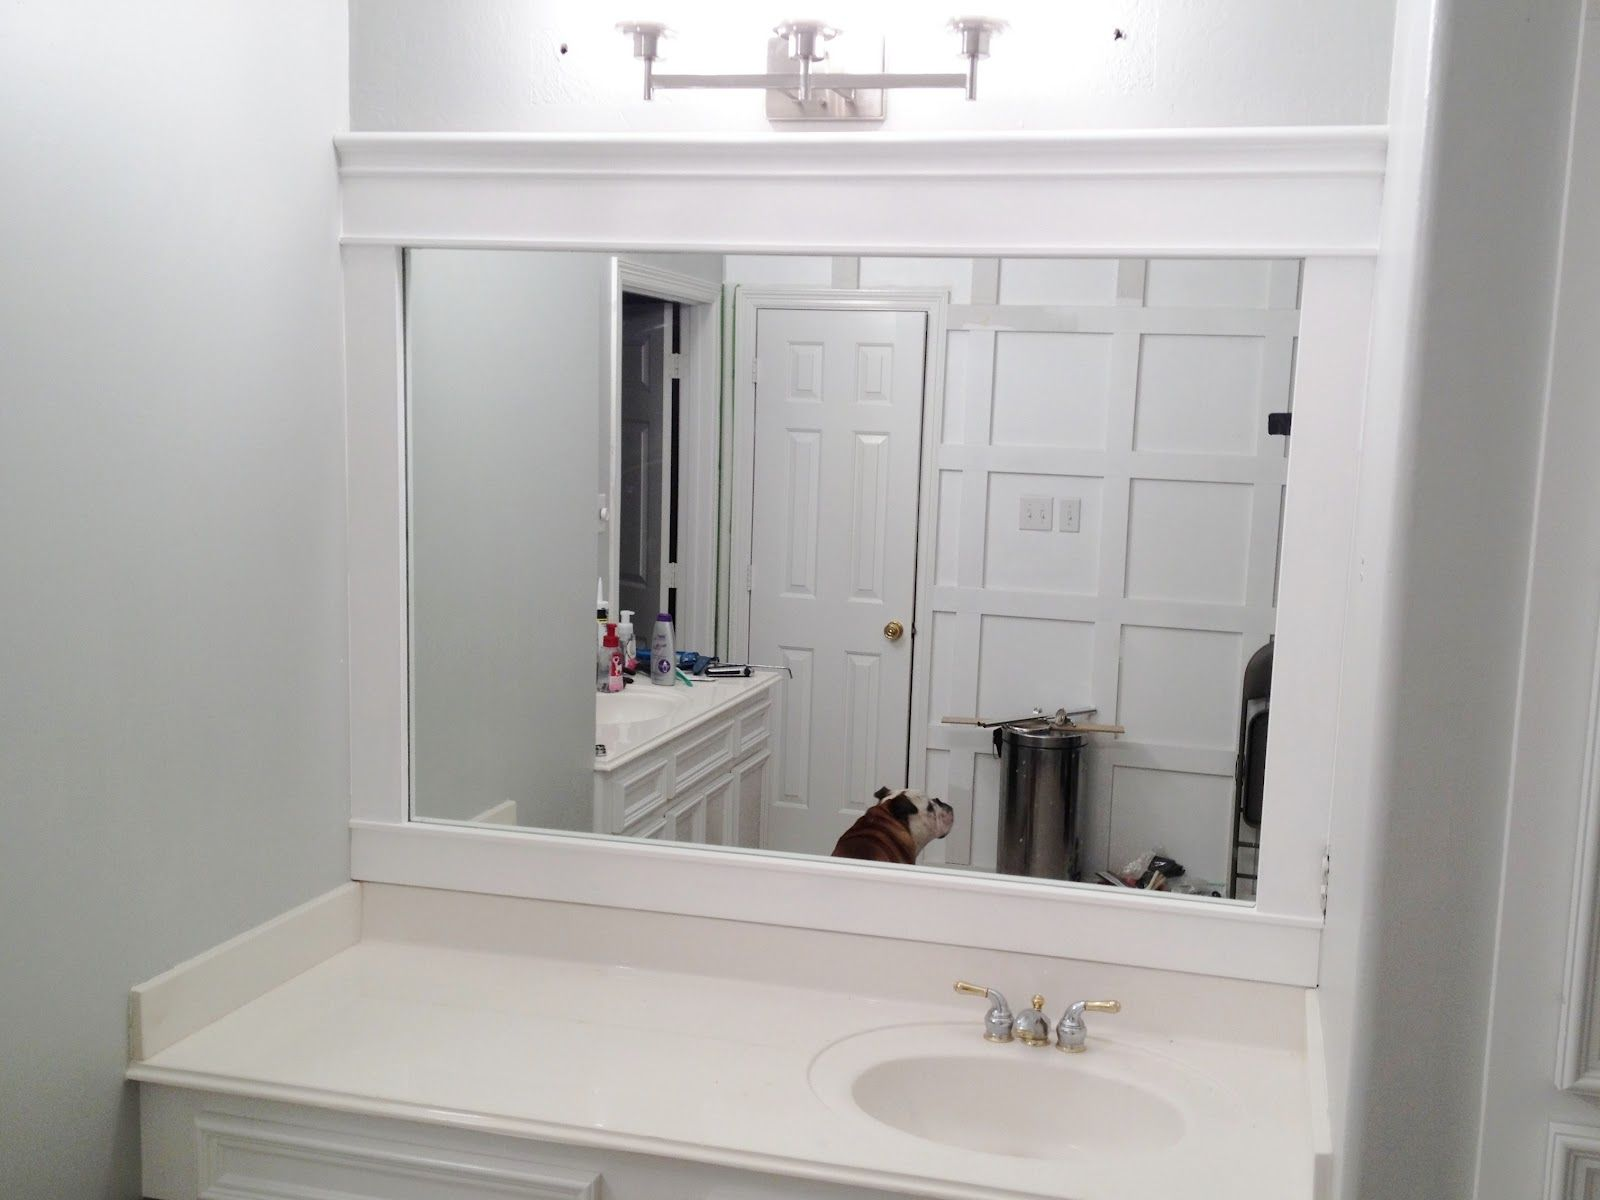 Bathroom Interior Elegant White Framed Wall Mirror Over